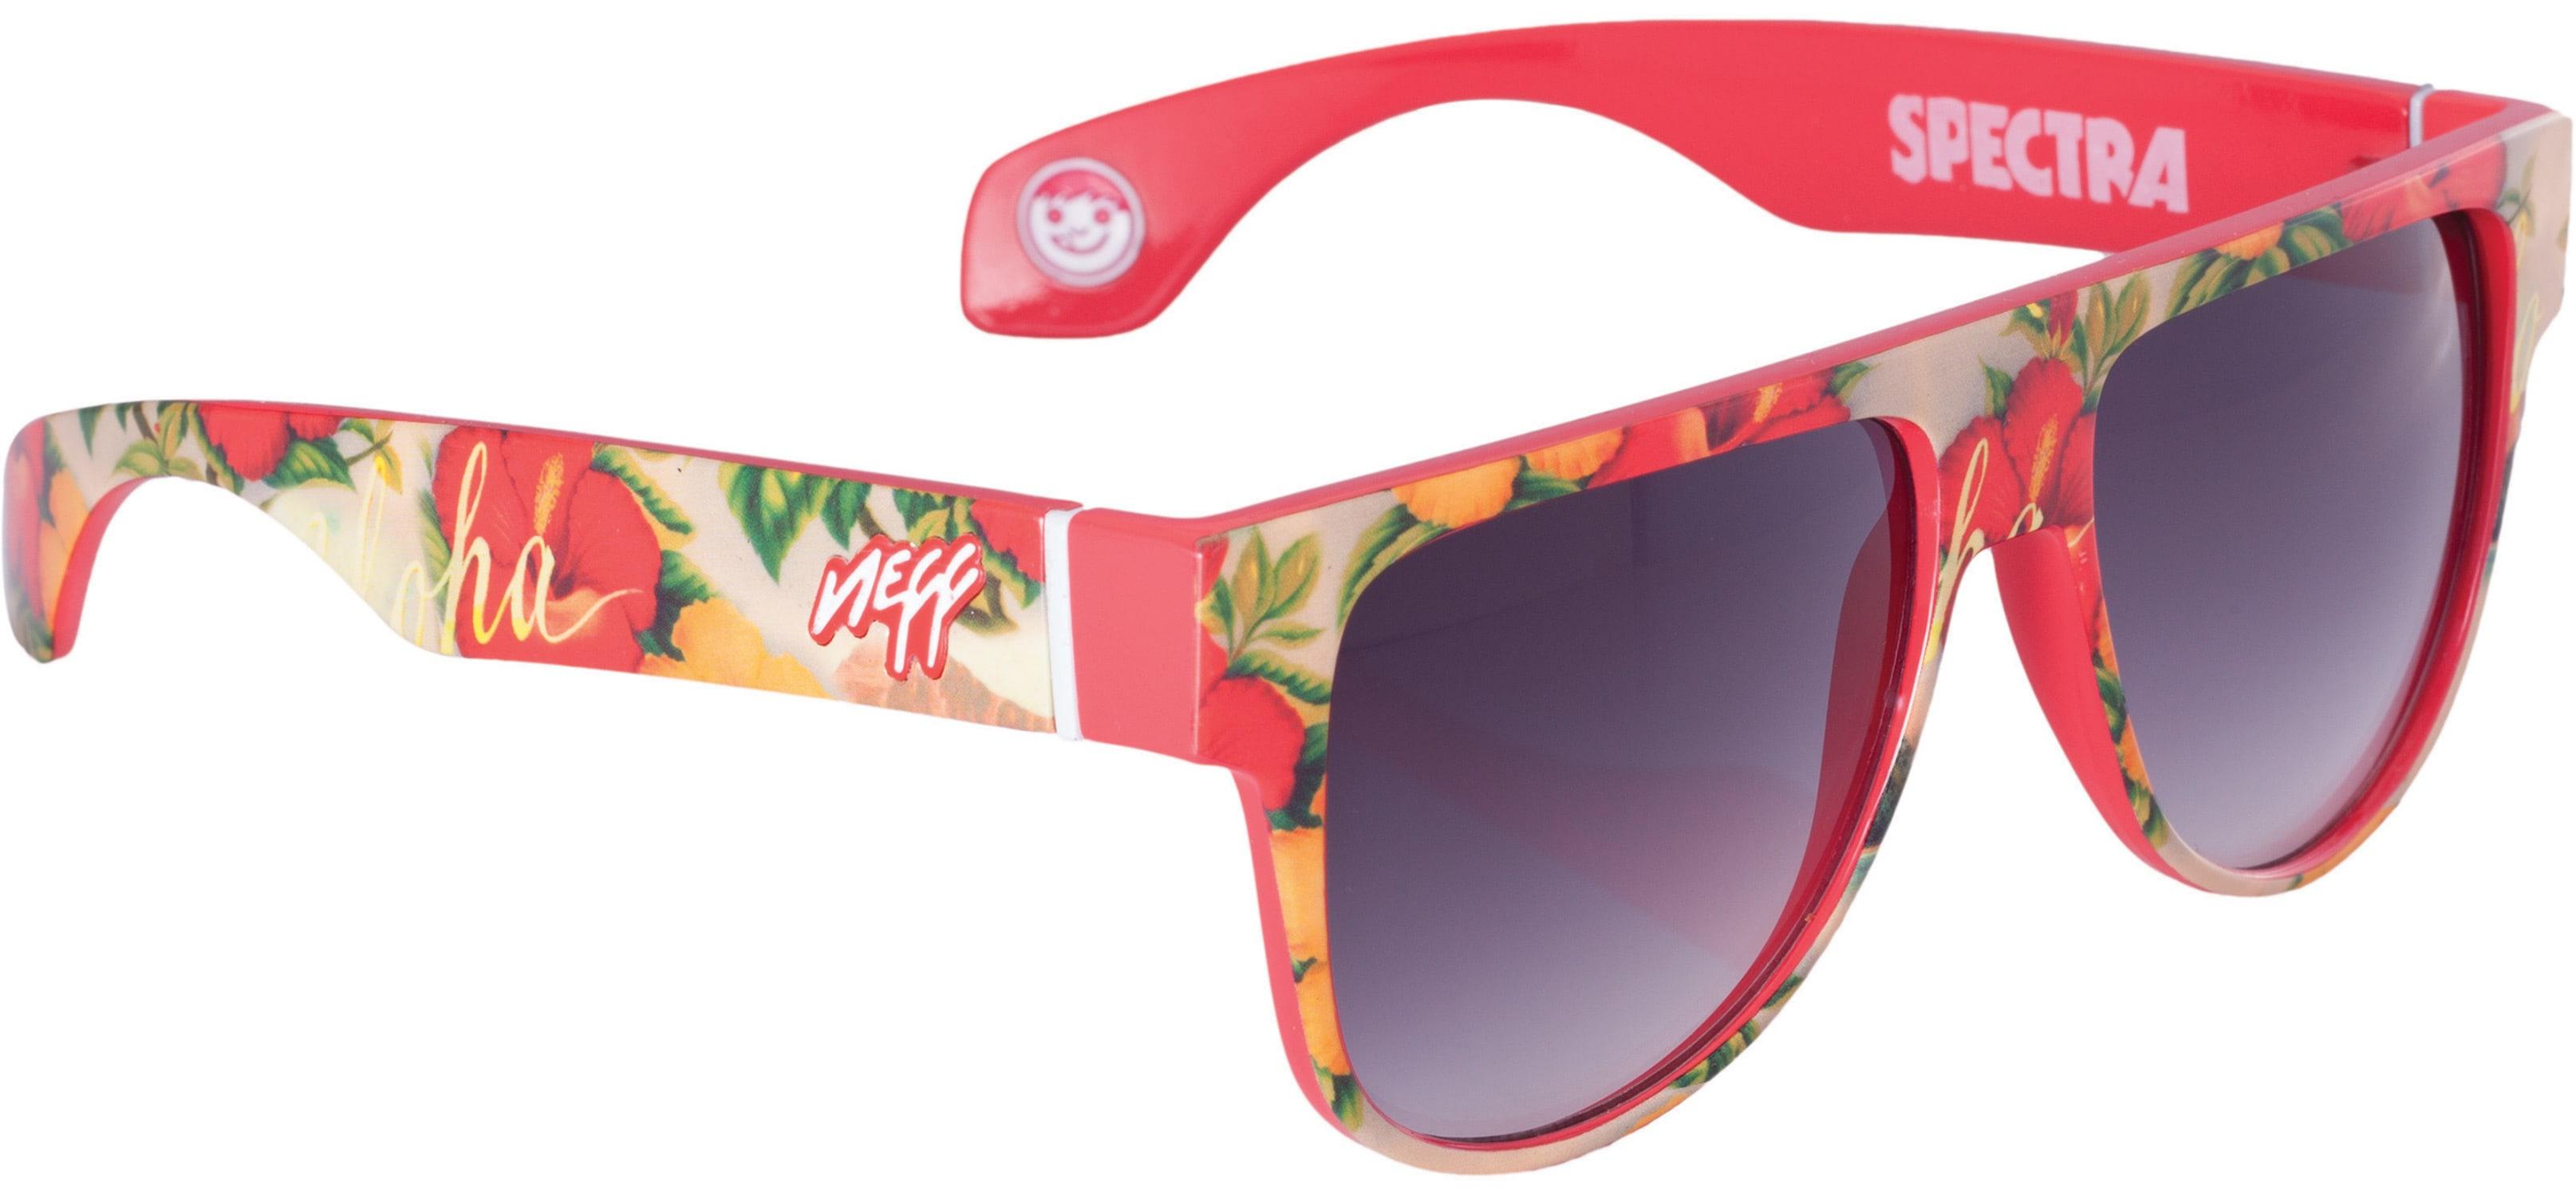 cost of oakley sunglasses  of the neff